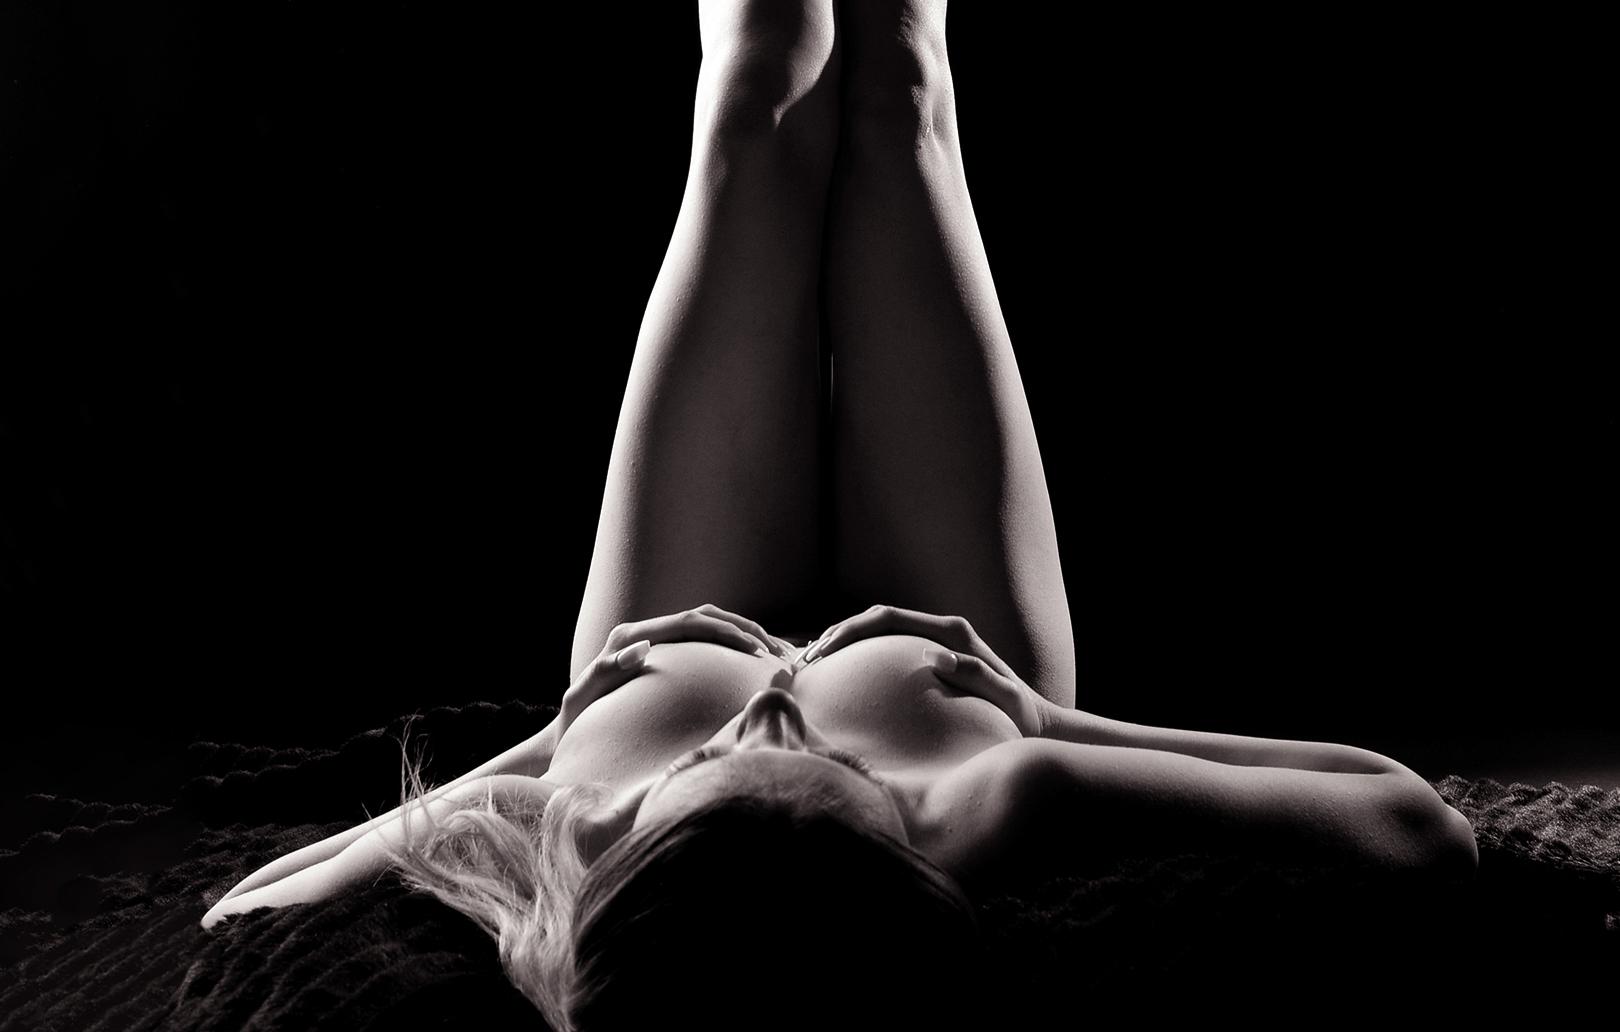 erotisches-fotoshooting-kiel-bg21610458012